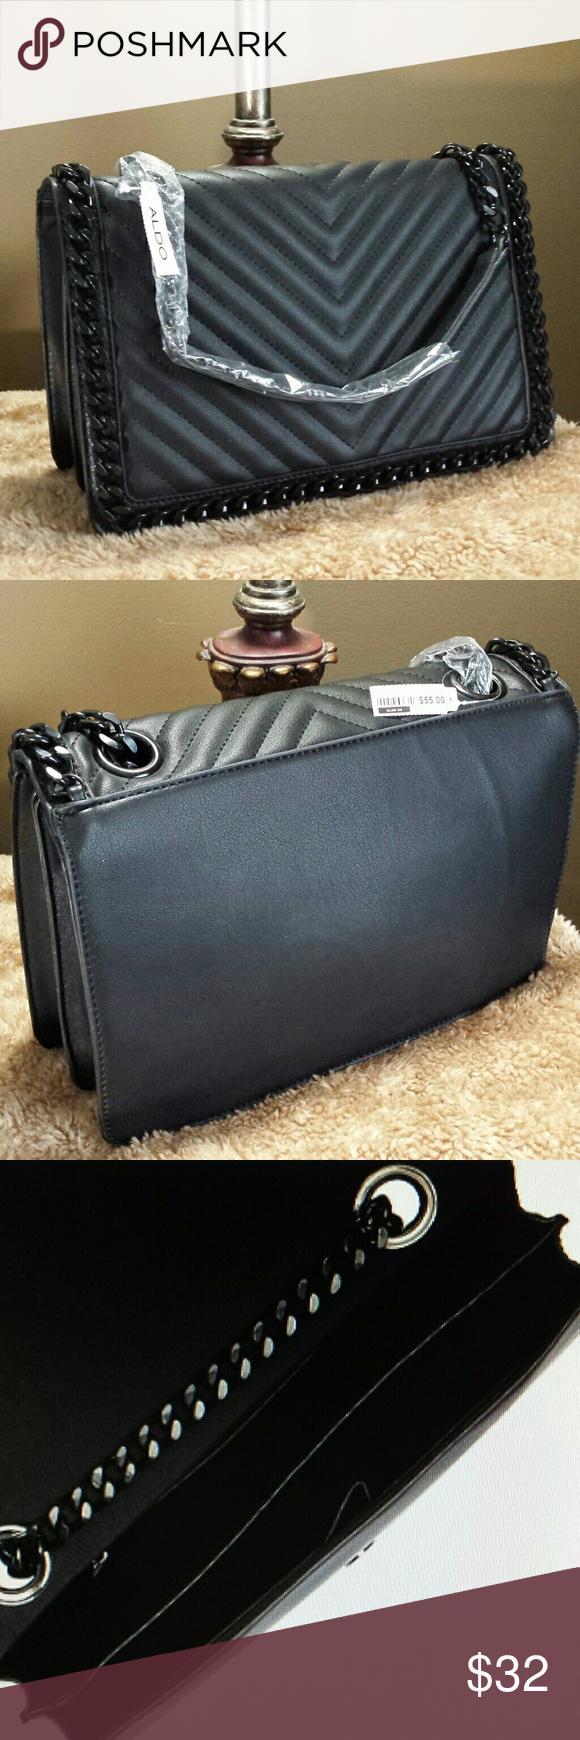 1feaf72dfbd Aldo - Black Crossbody  Shoulder Bag - NWT Aldo black chain strap multi  compartment Crossbody   Shoulder Bag - NWT ALDO Bags Crossbody Bags